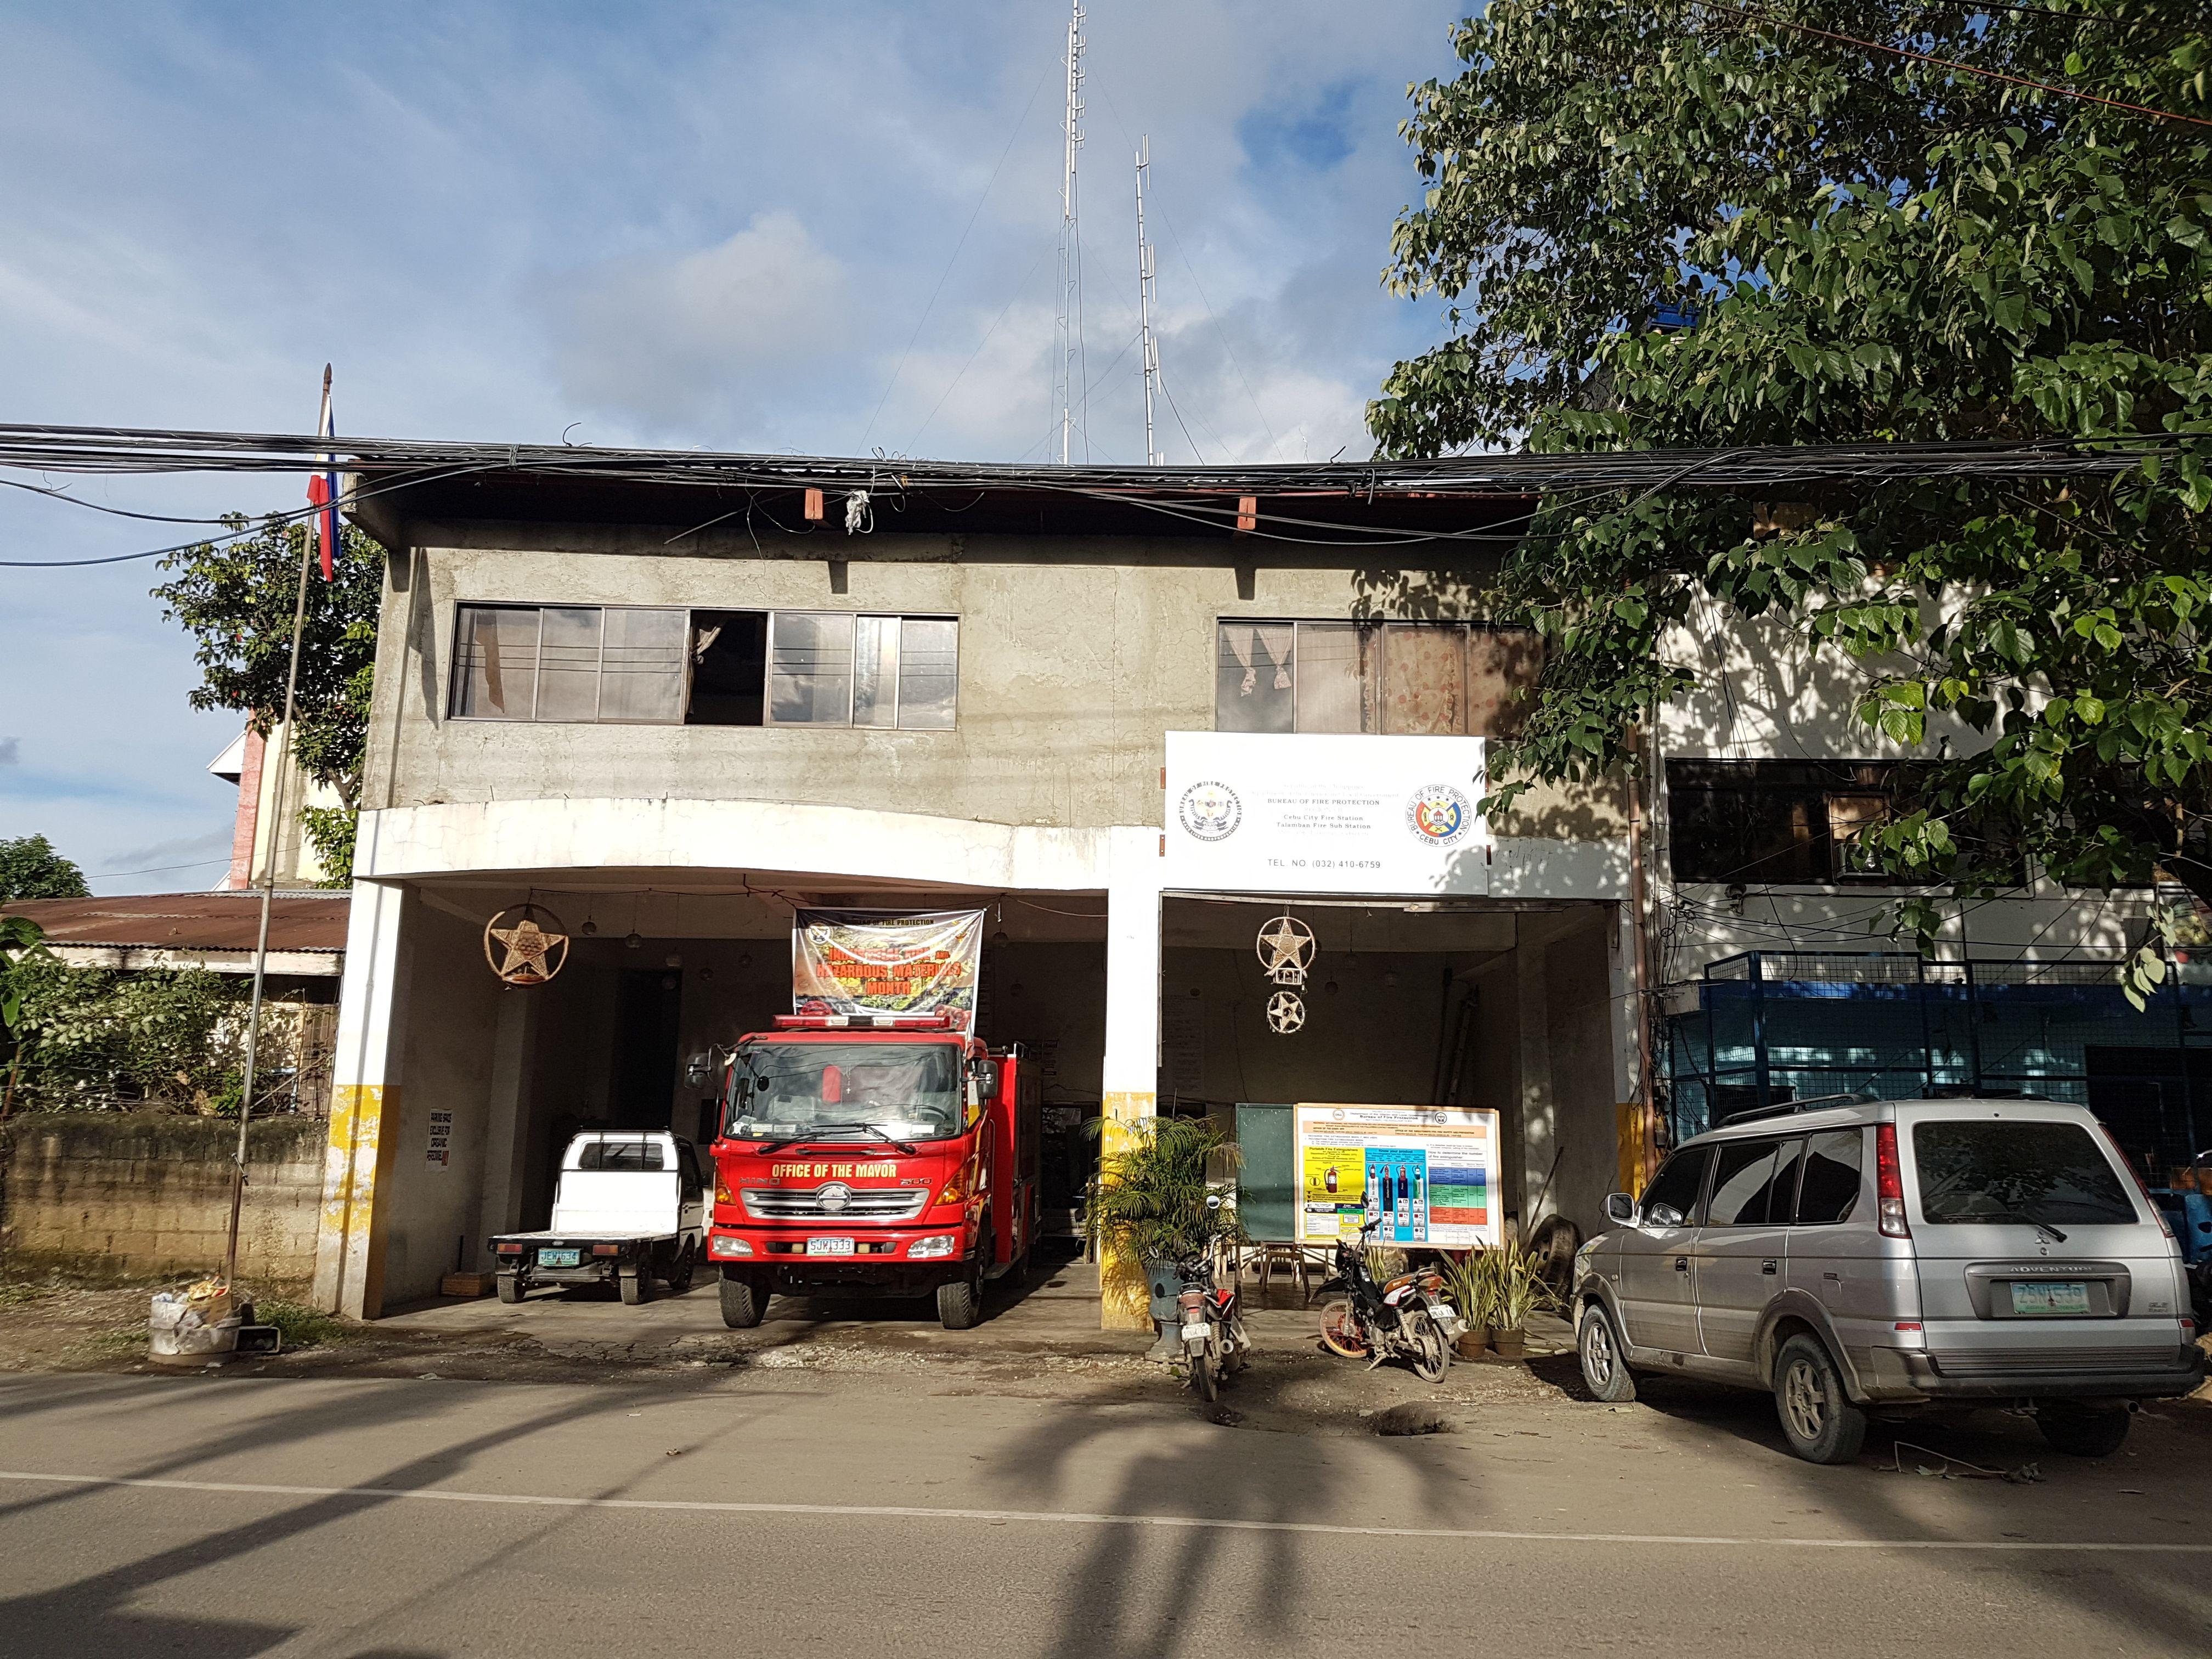 Cebu City Fire Station Fire station, Cebu city, Philippines